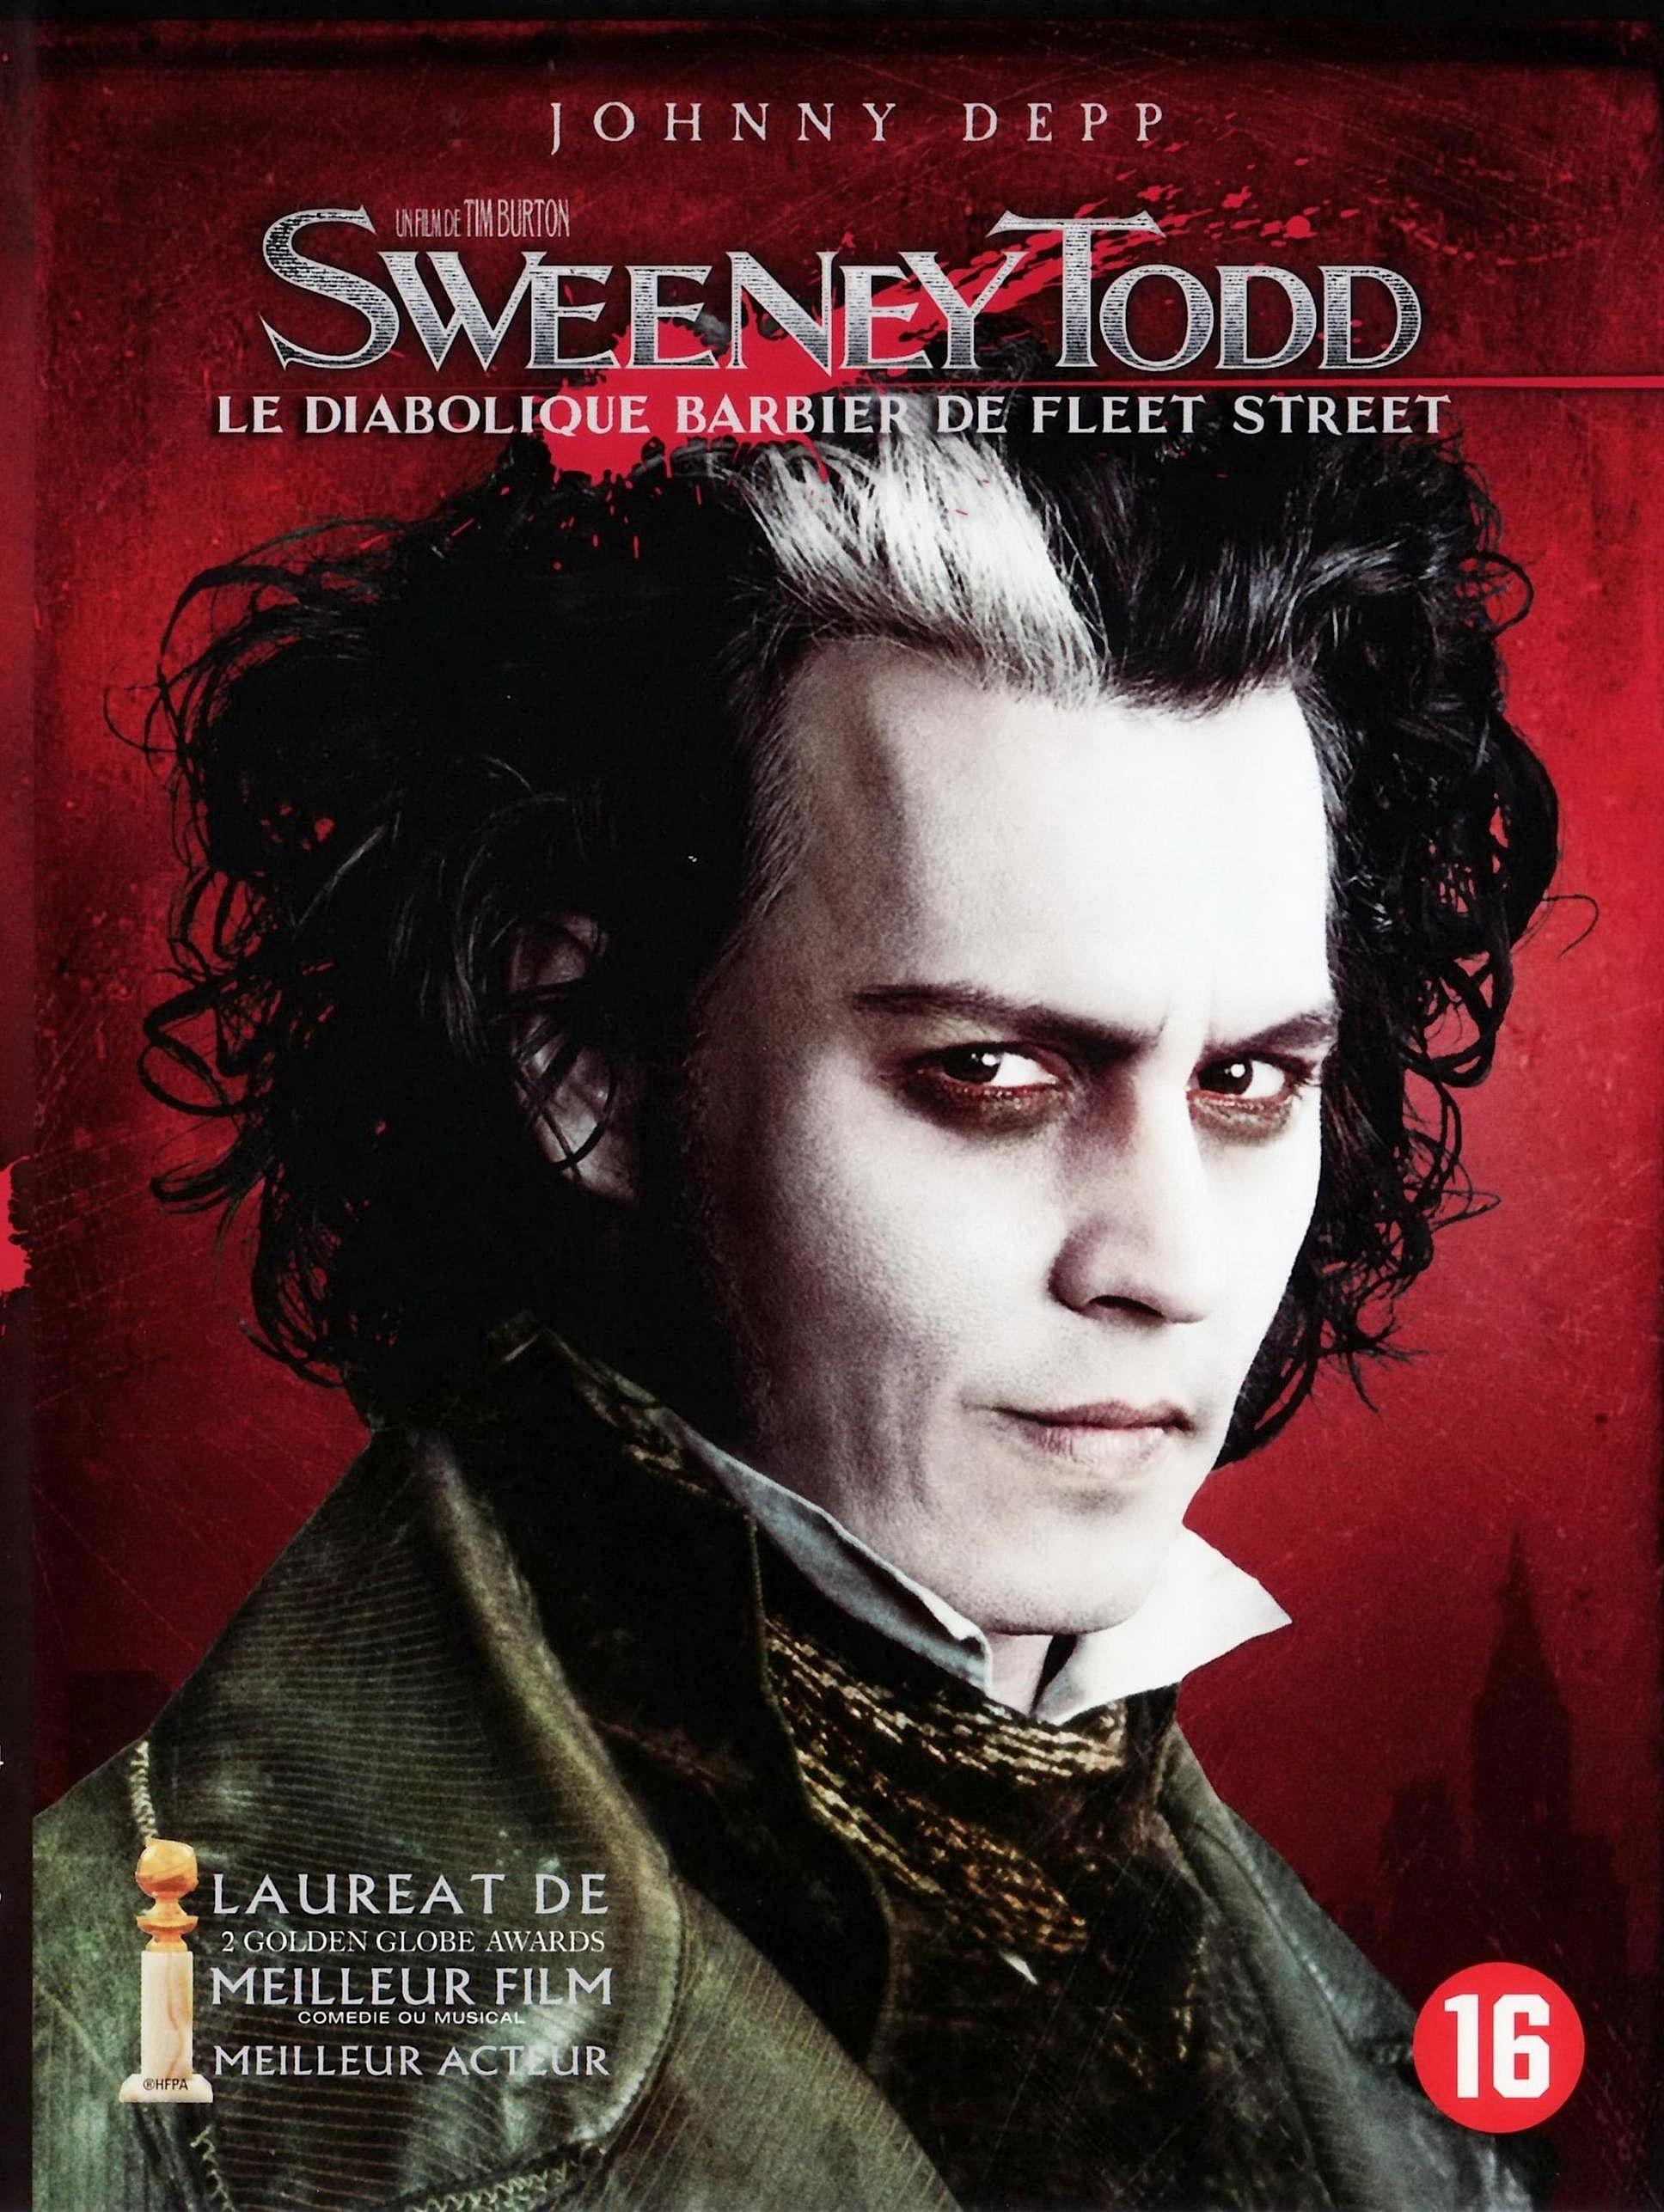 Sweeney Todd Sweeney Todd Fleet Street Johnny Depp